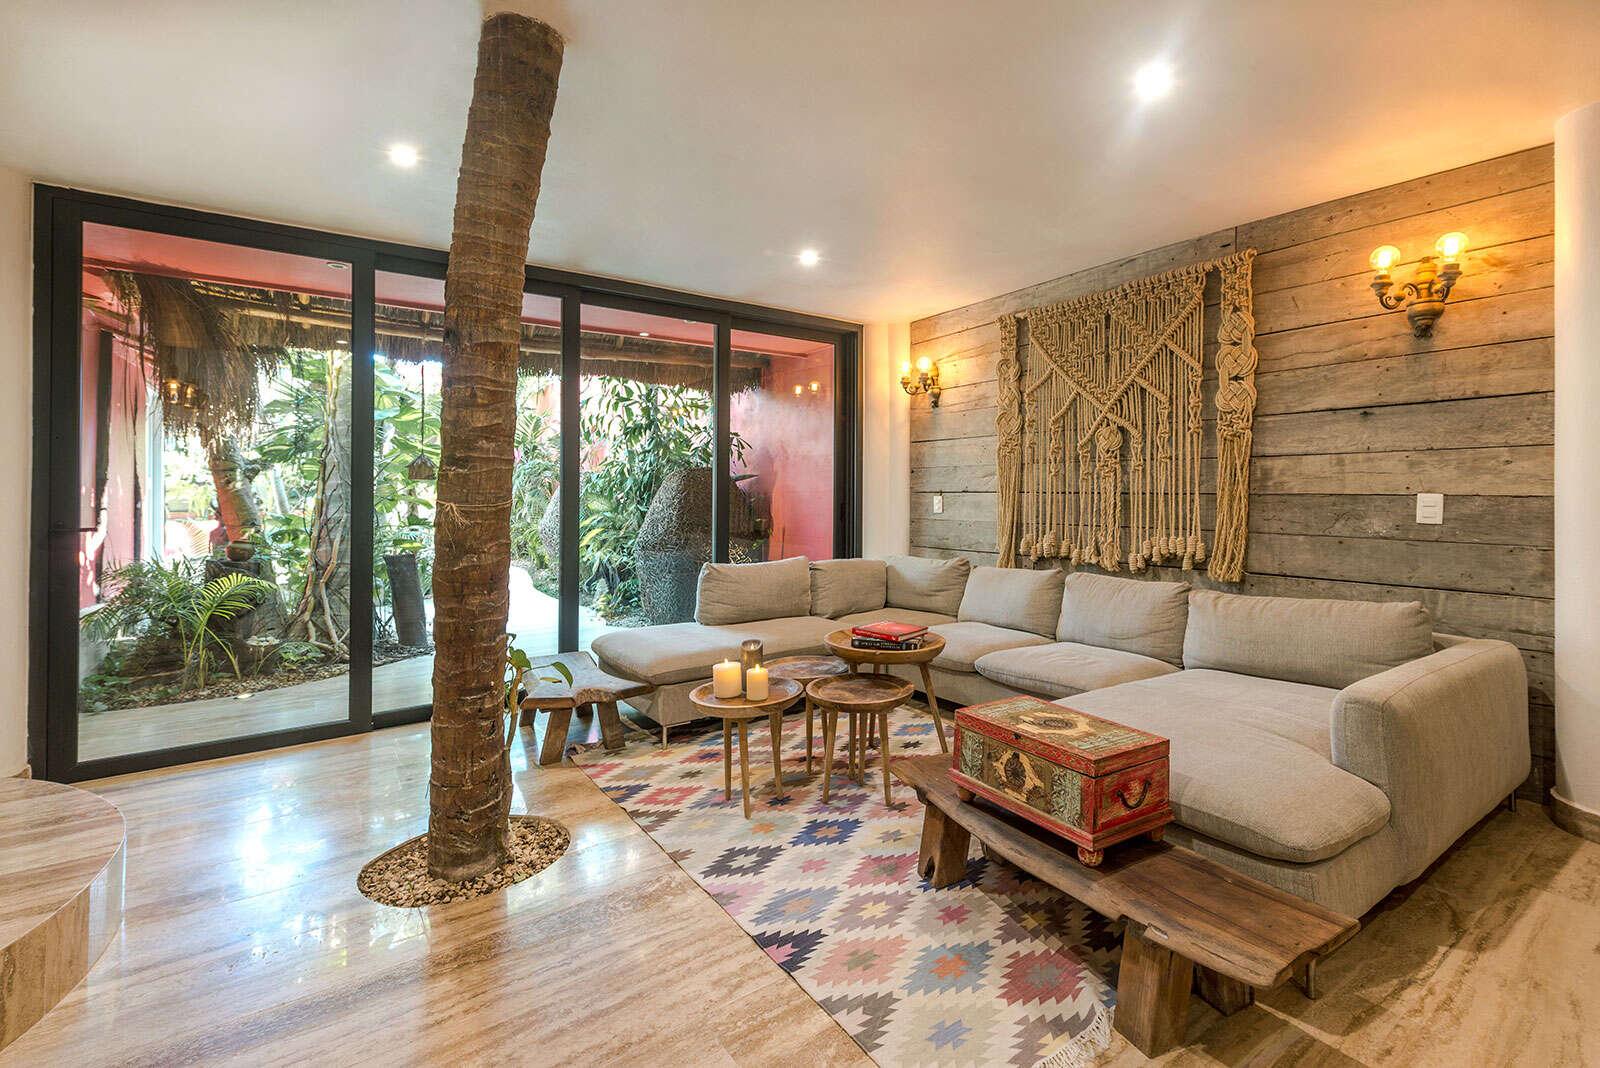 Luxury vacation rentals mexico - Riviera maya - Tulum - Tulum beach zone - Bejuco House - Image 1/19